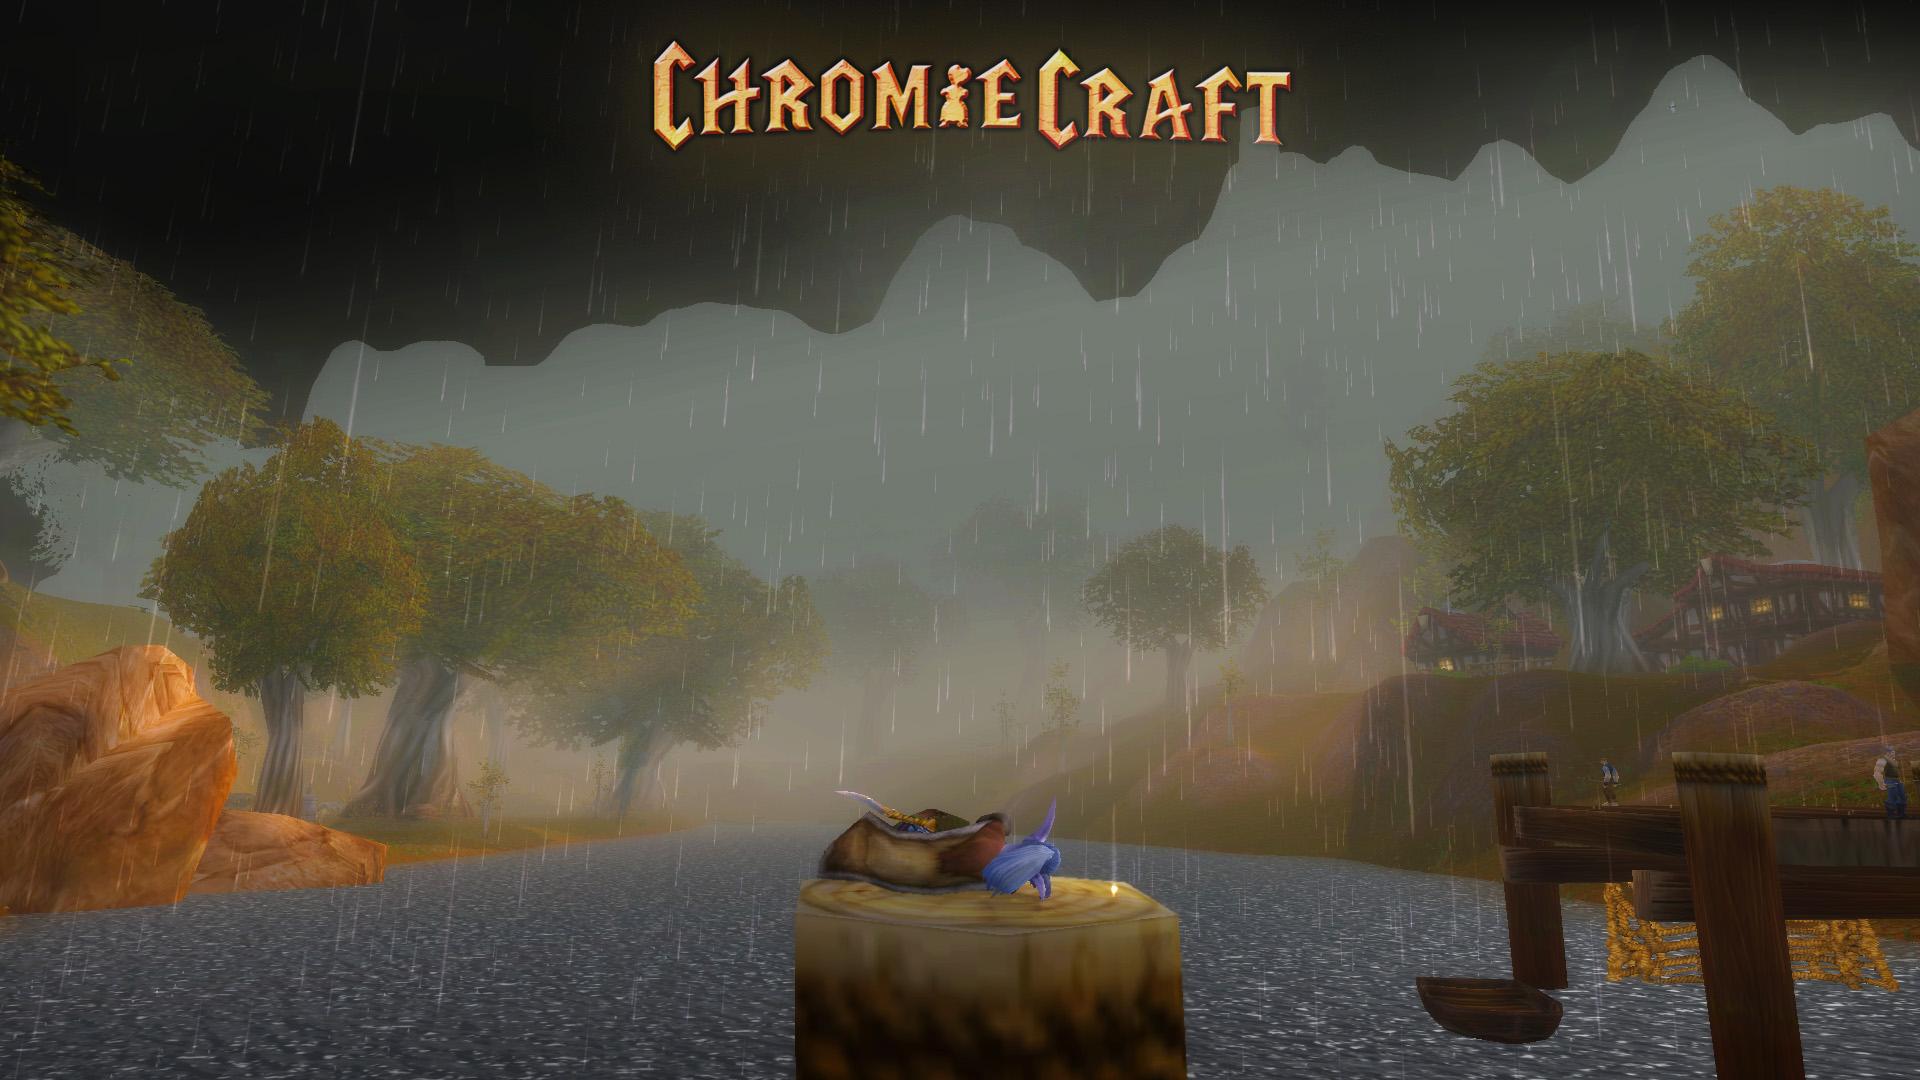 Redrige Mountains - ChromieCraft artwork by Joy